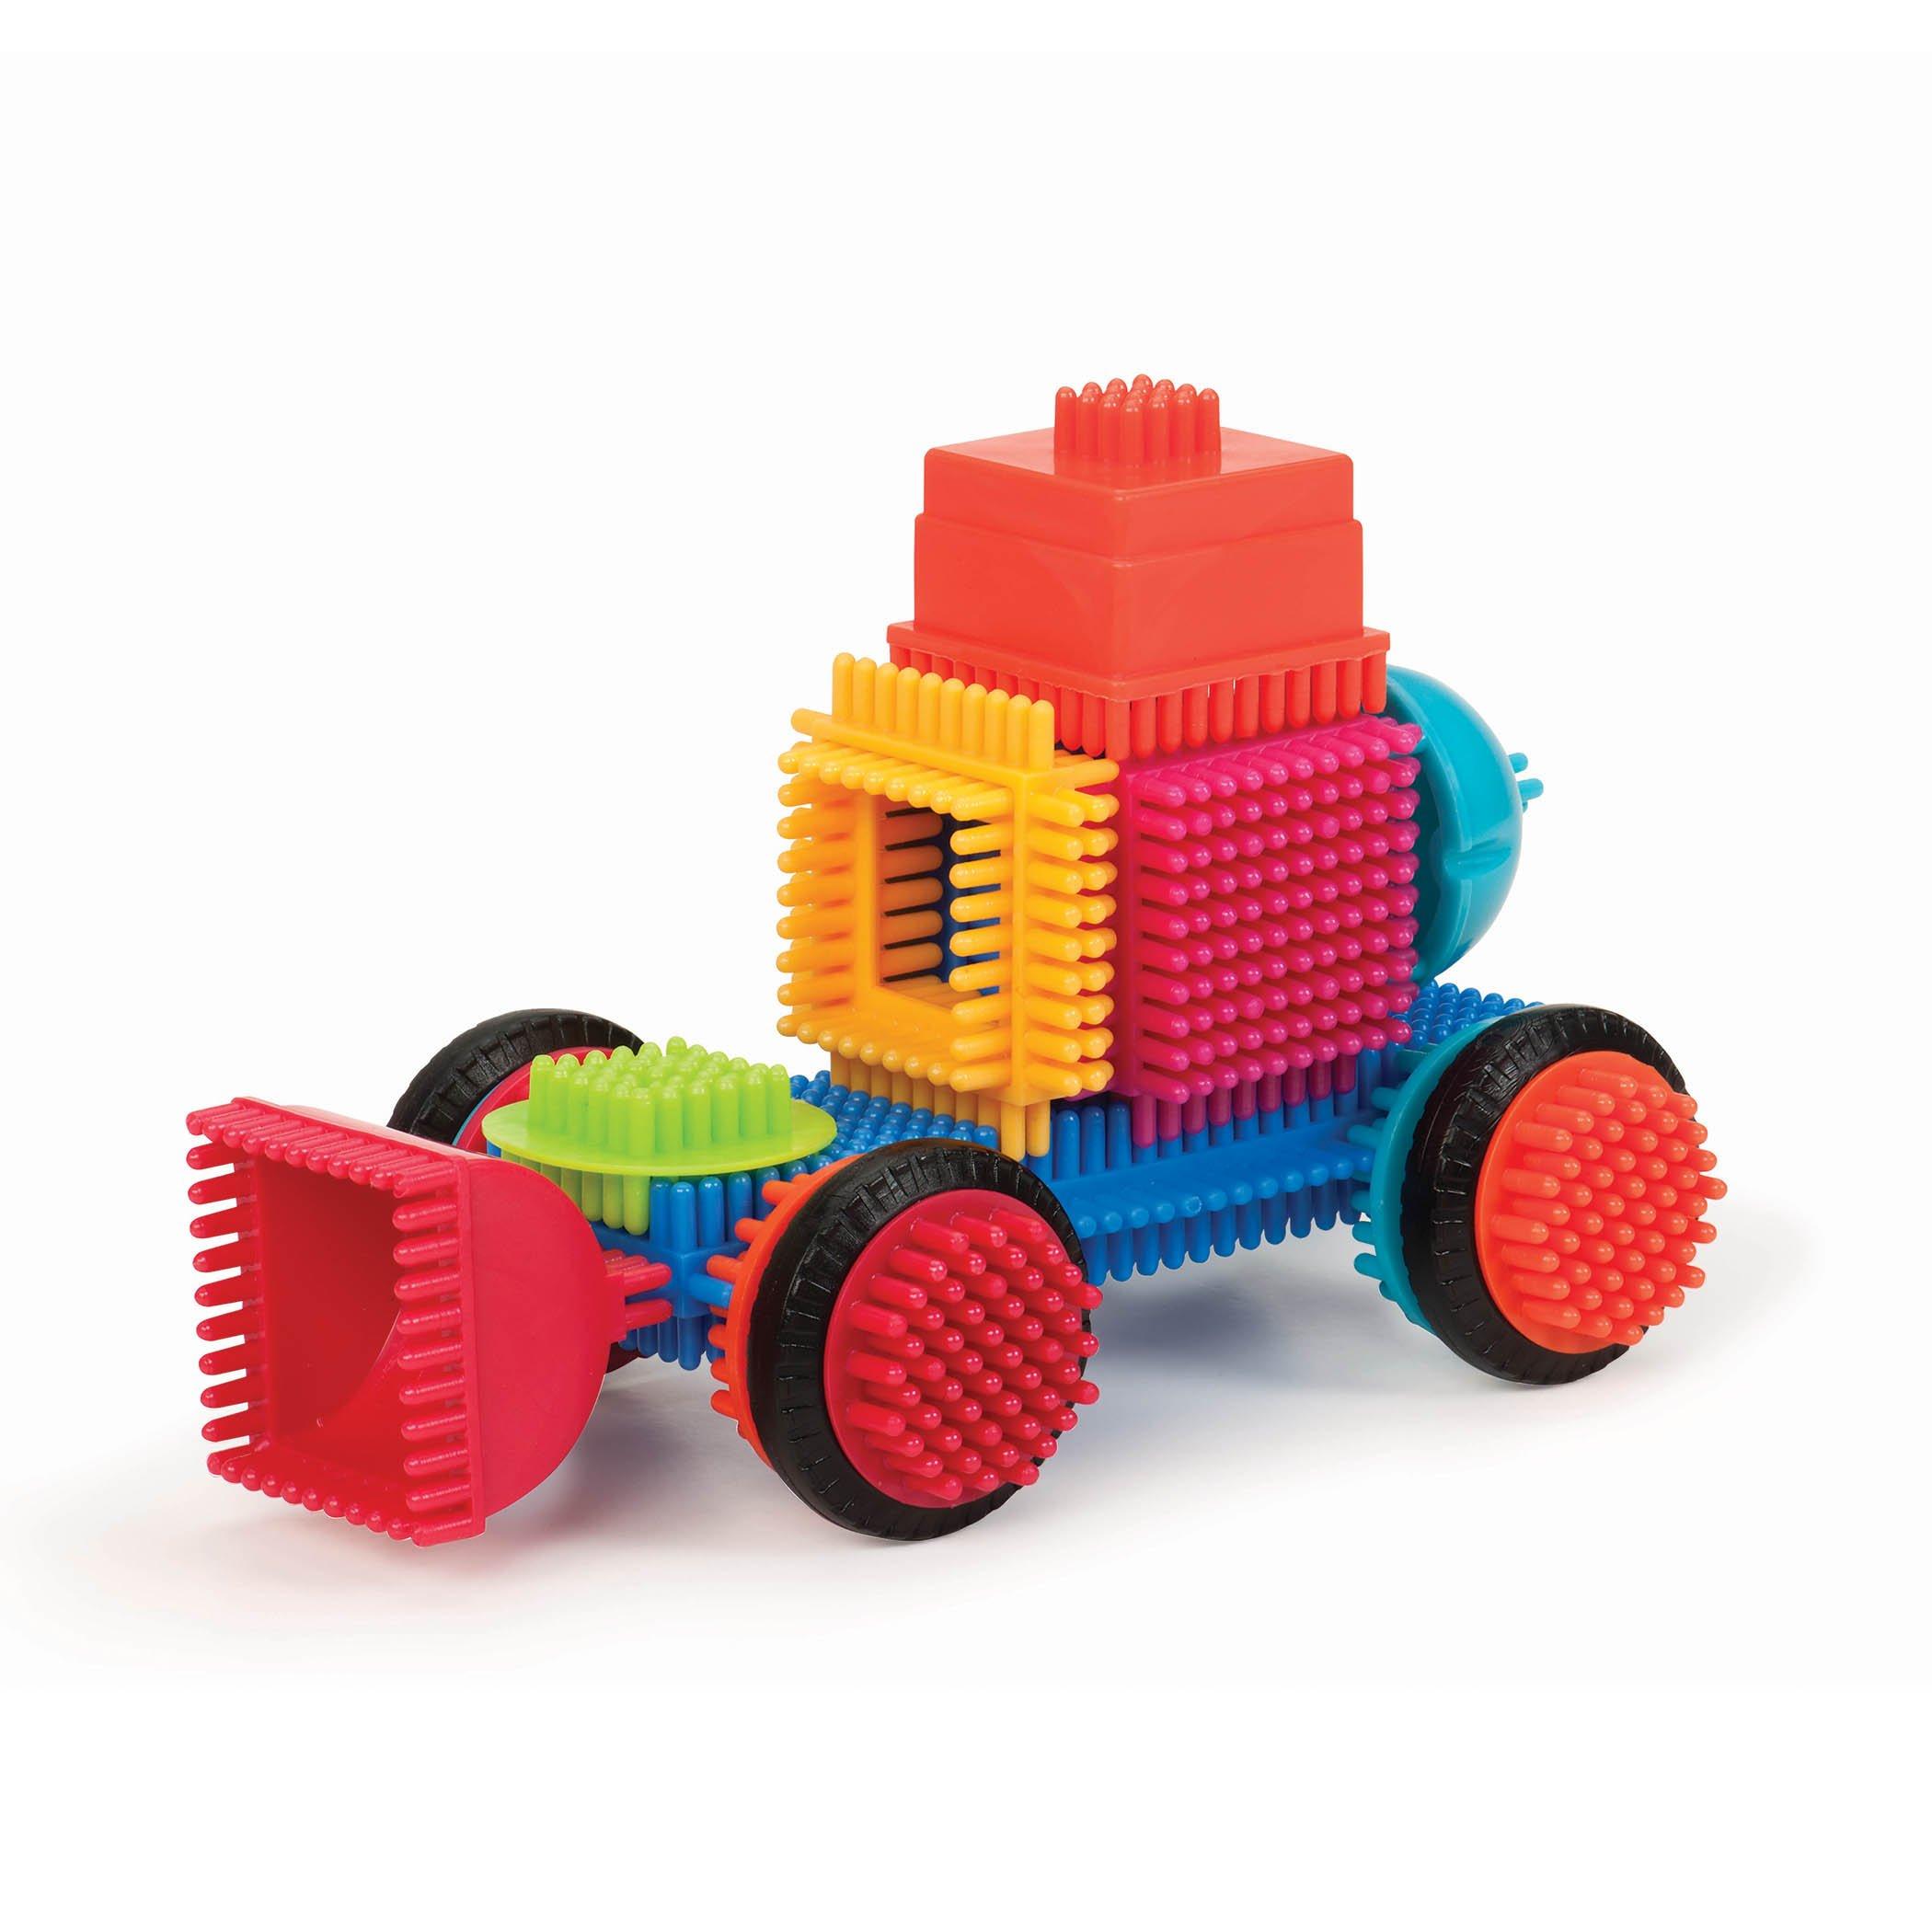 80 Pieces Big Value ... The Official Bristle Blocks Bristle Blocks by Battat